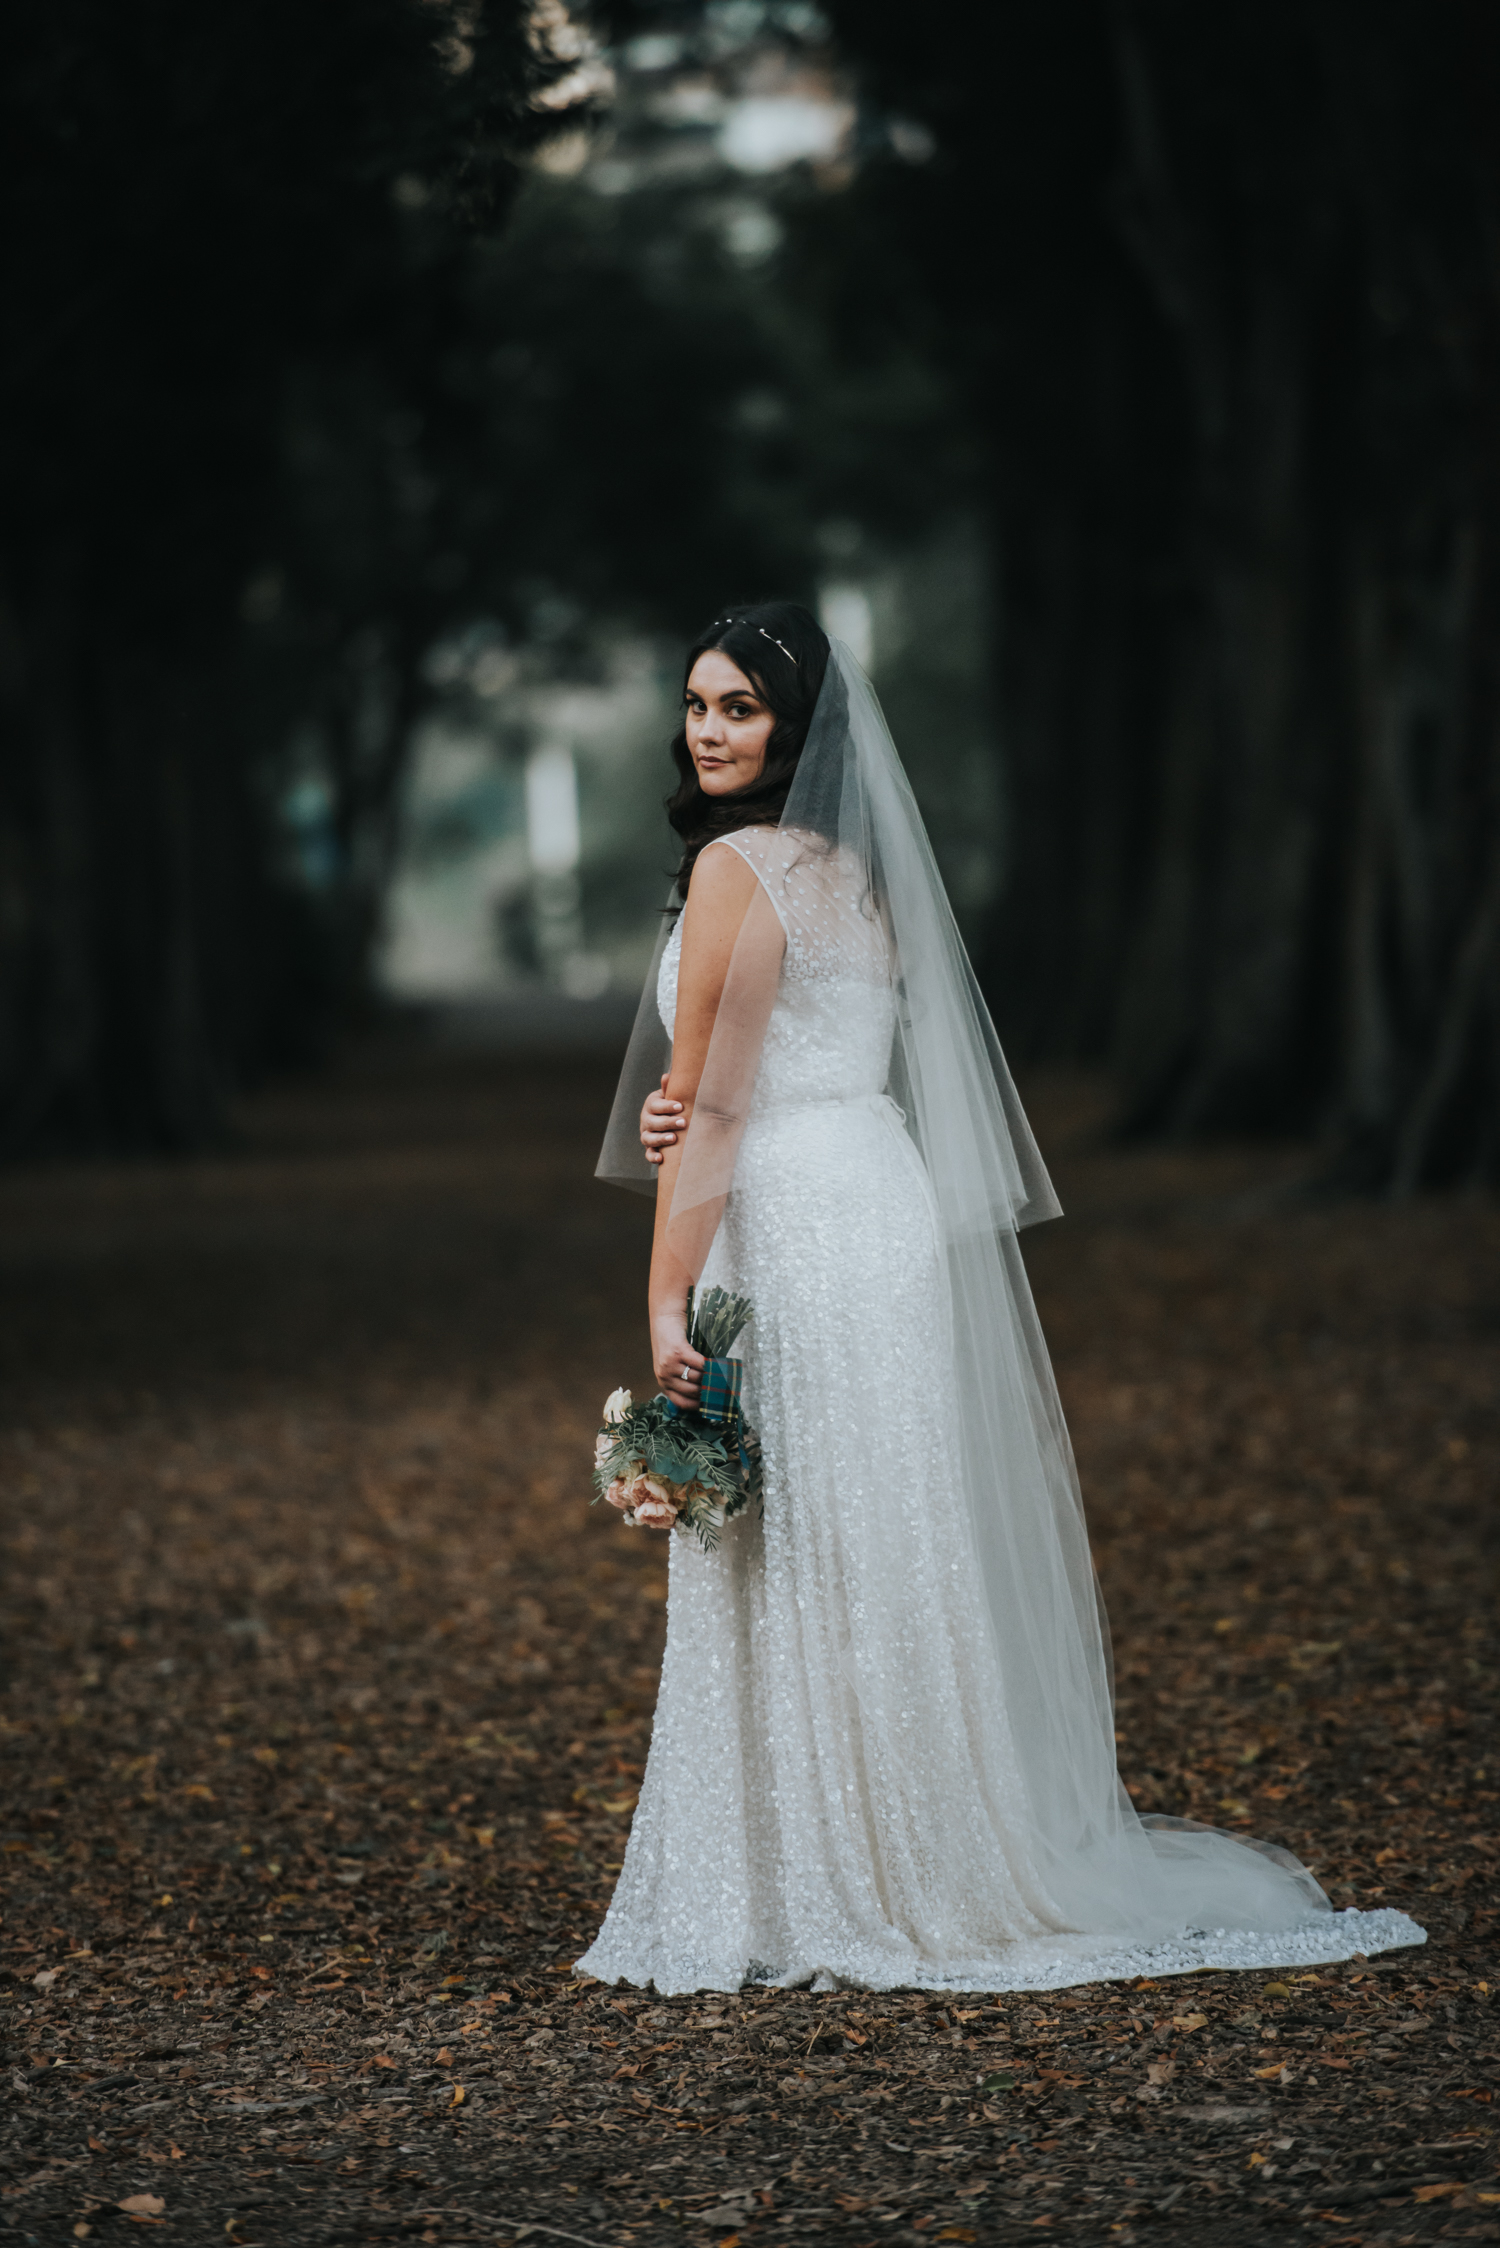 Brisbane Wedding Photographer | Beautiful intimate elopement photography-53.jpg